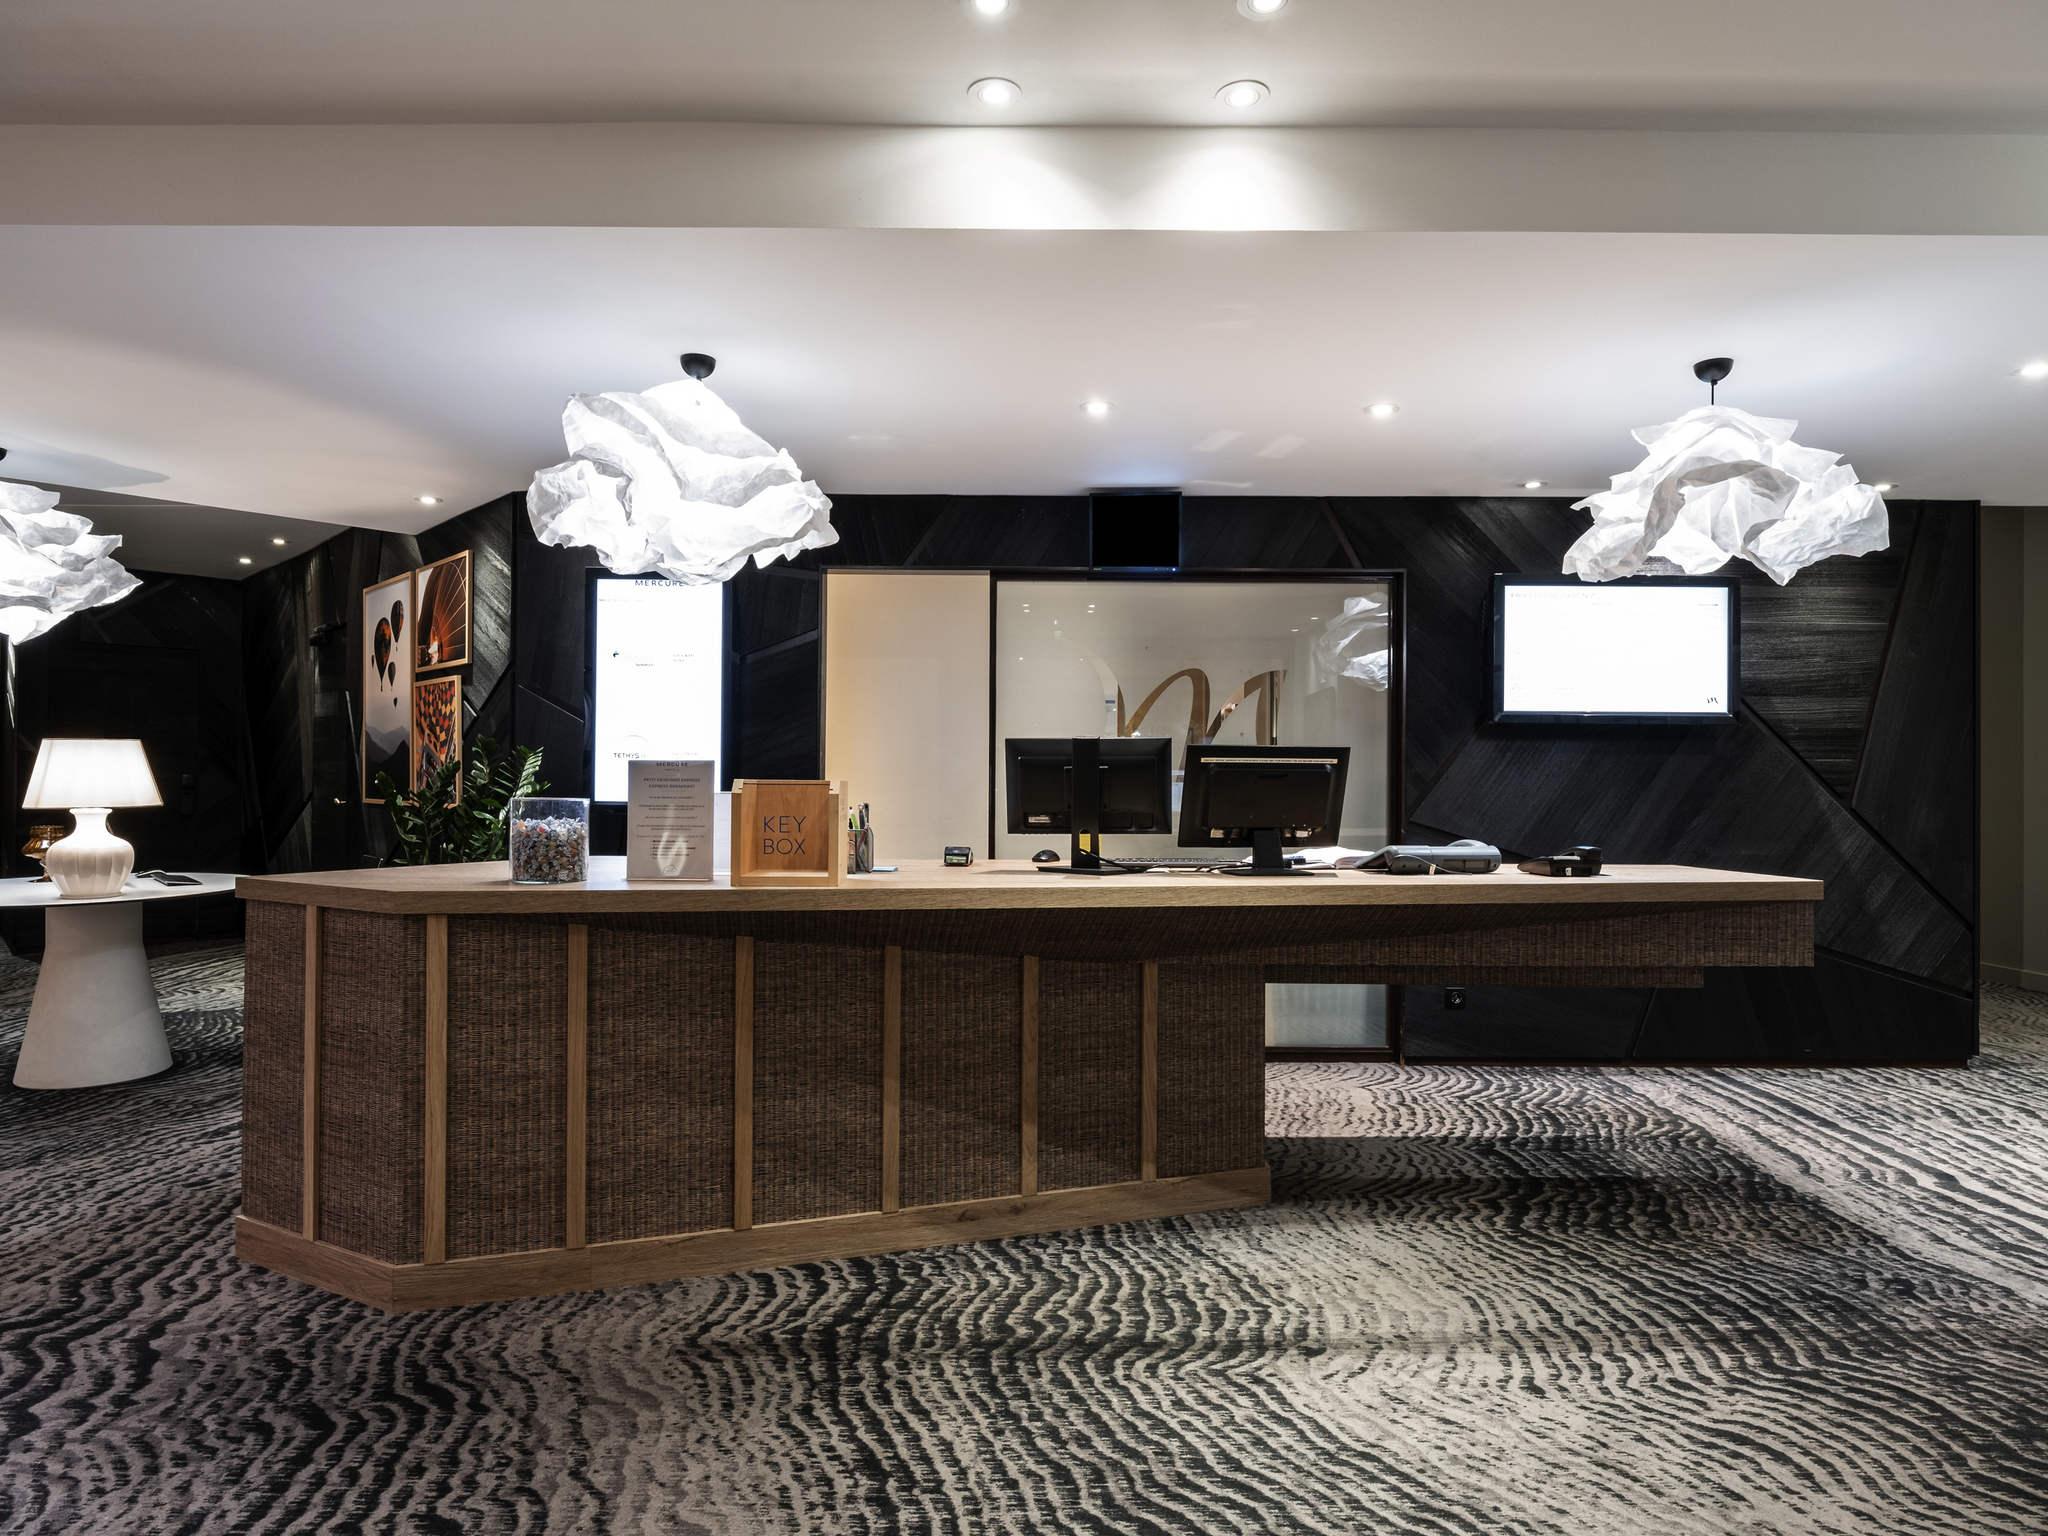 Hotel – Albergo Mercure Grenoble Meylan